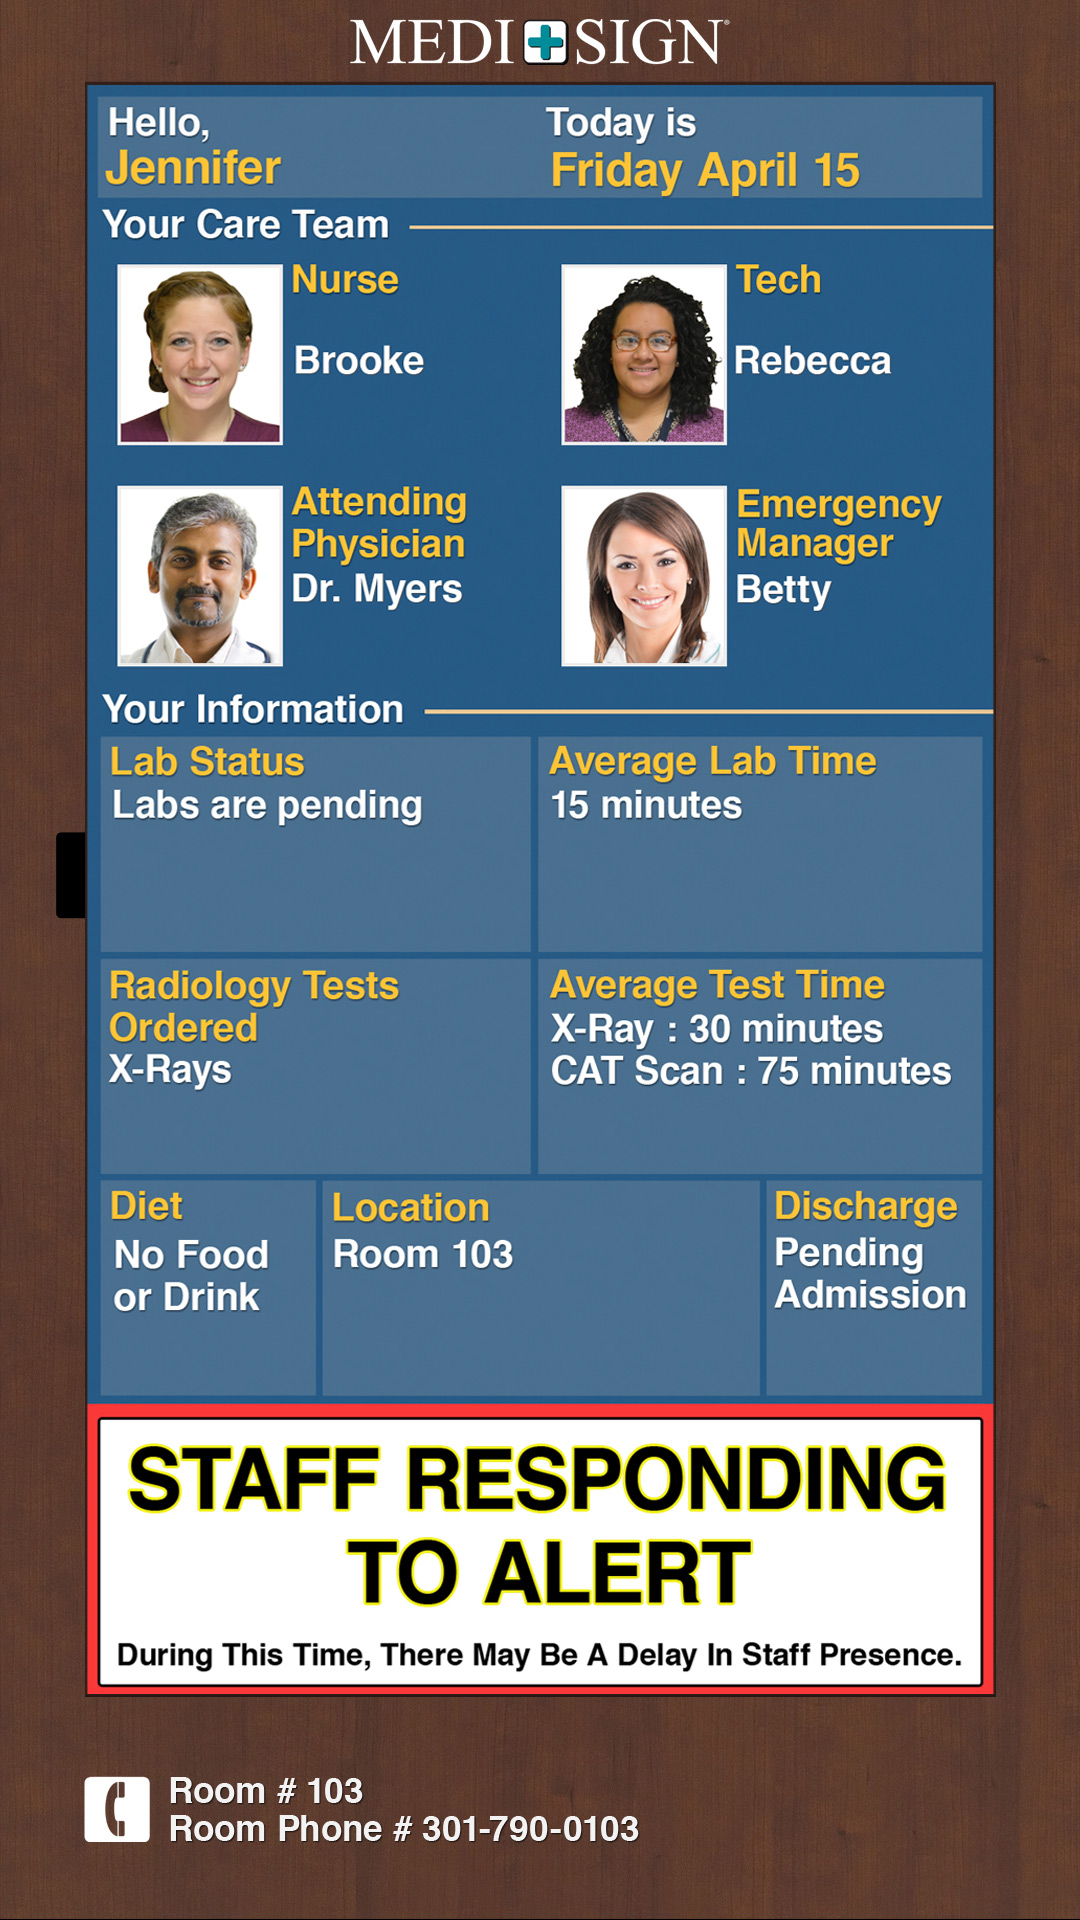 Digital Exam Room Whiteboards for Emergency Department